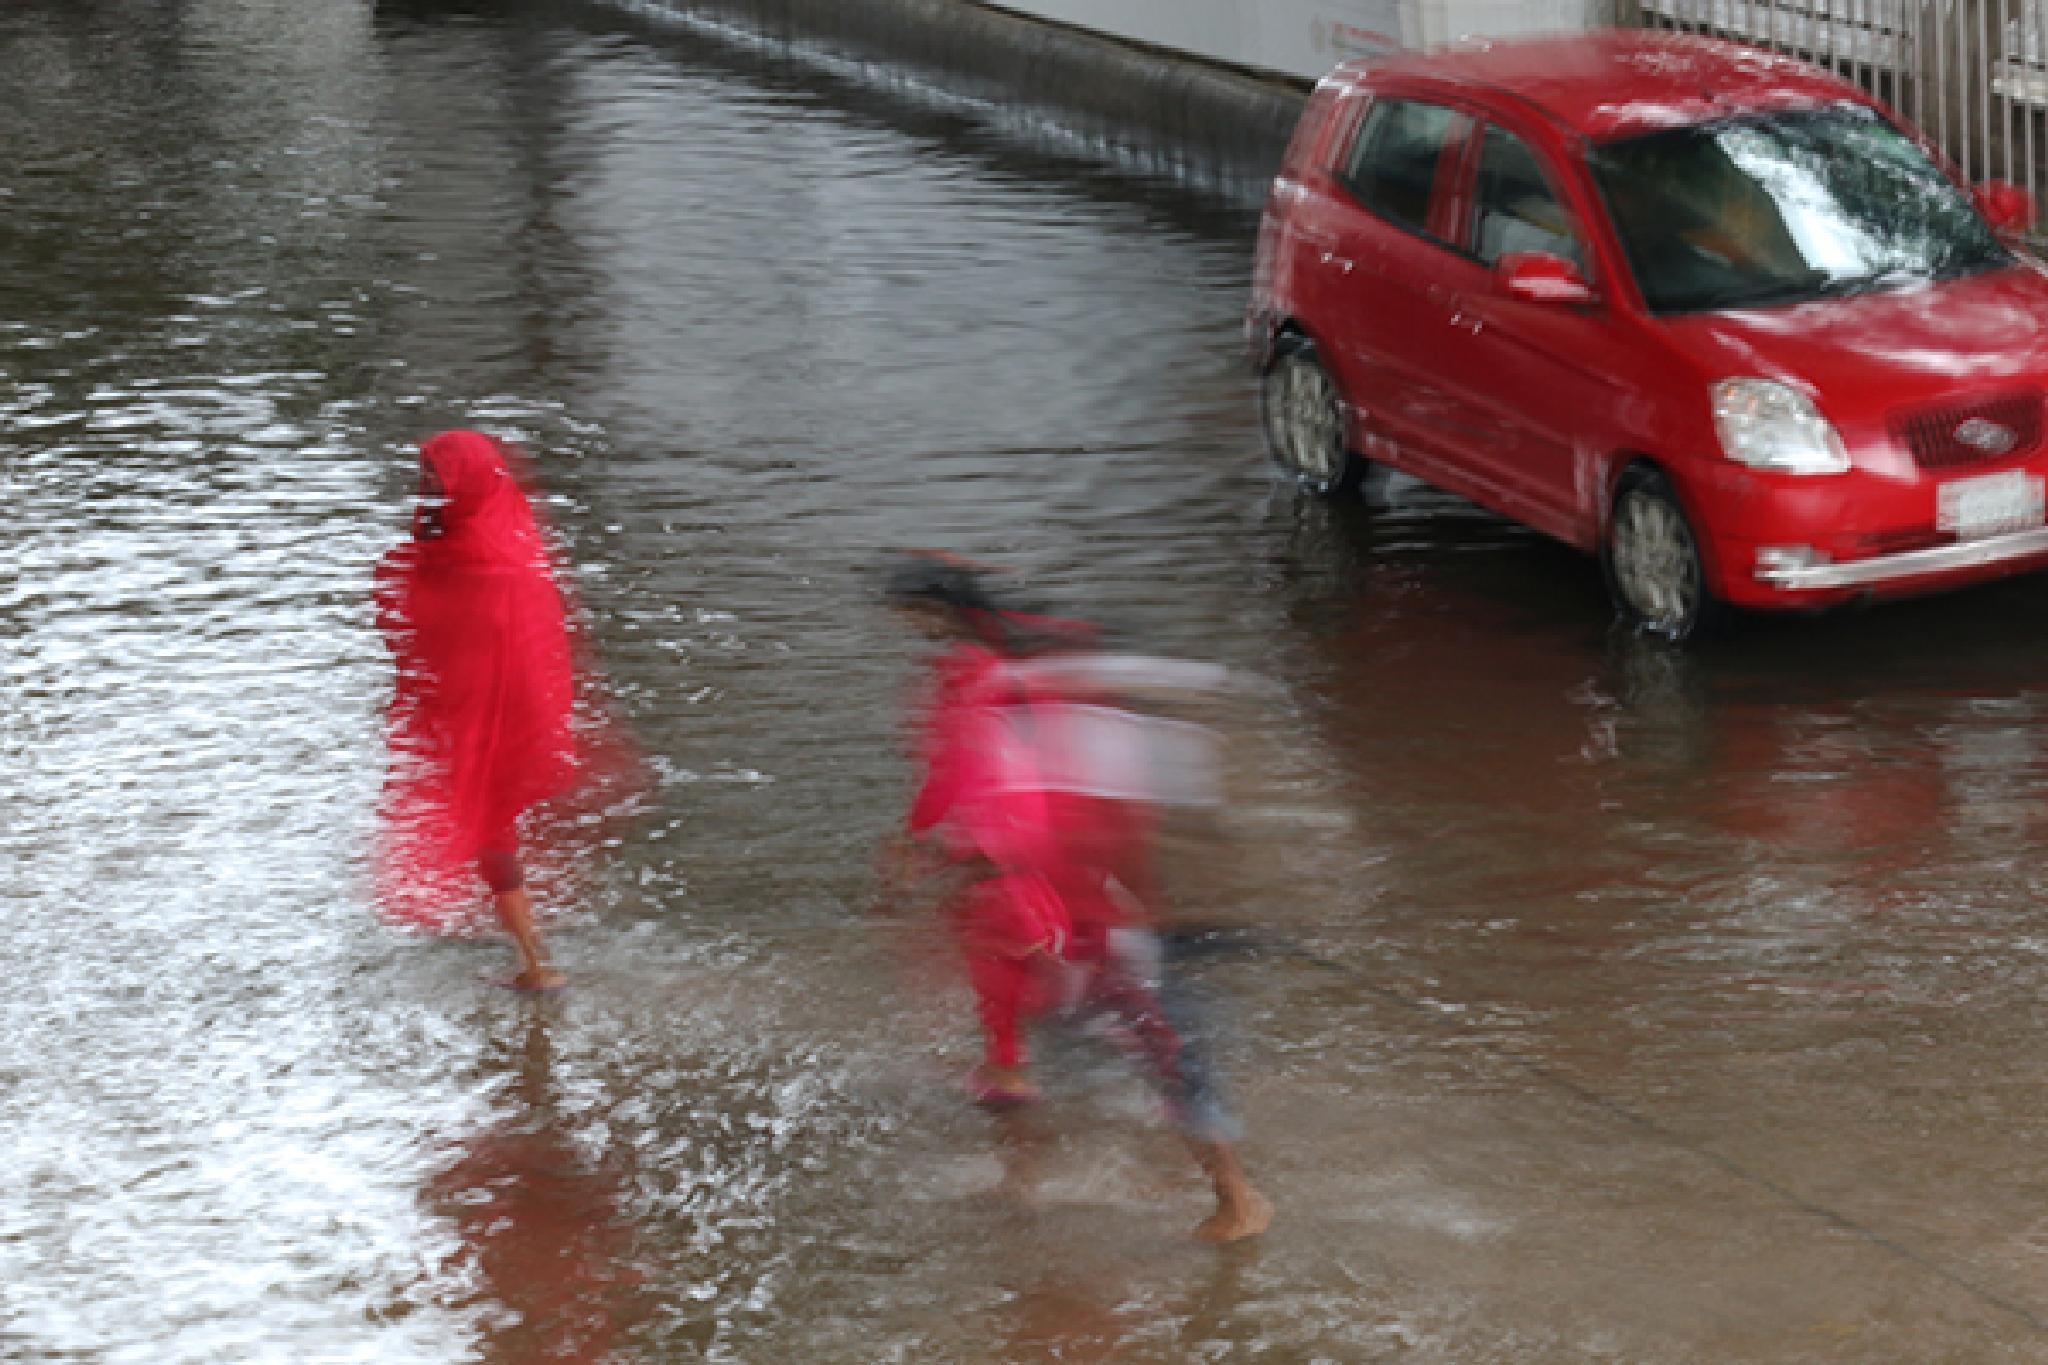 rainy life  by Babul Abdul Malek